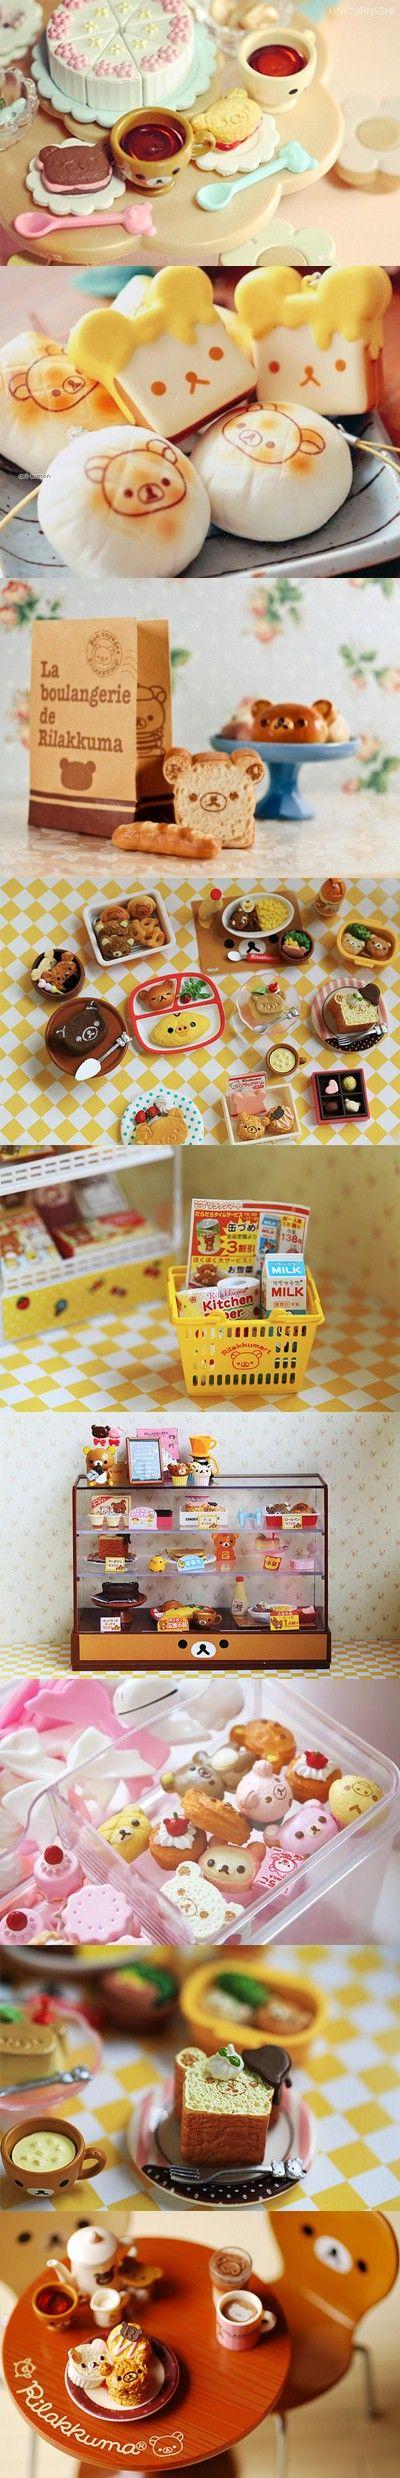 #Rilakkuma Re-Ment miniatures: http://www.modes4u.com/japanese/rilakkuma+re-ment